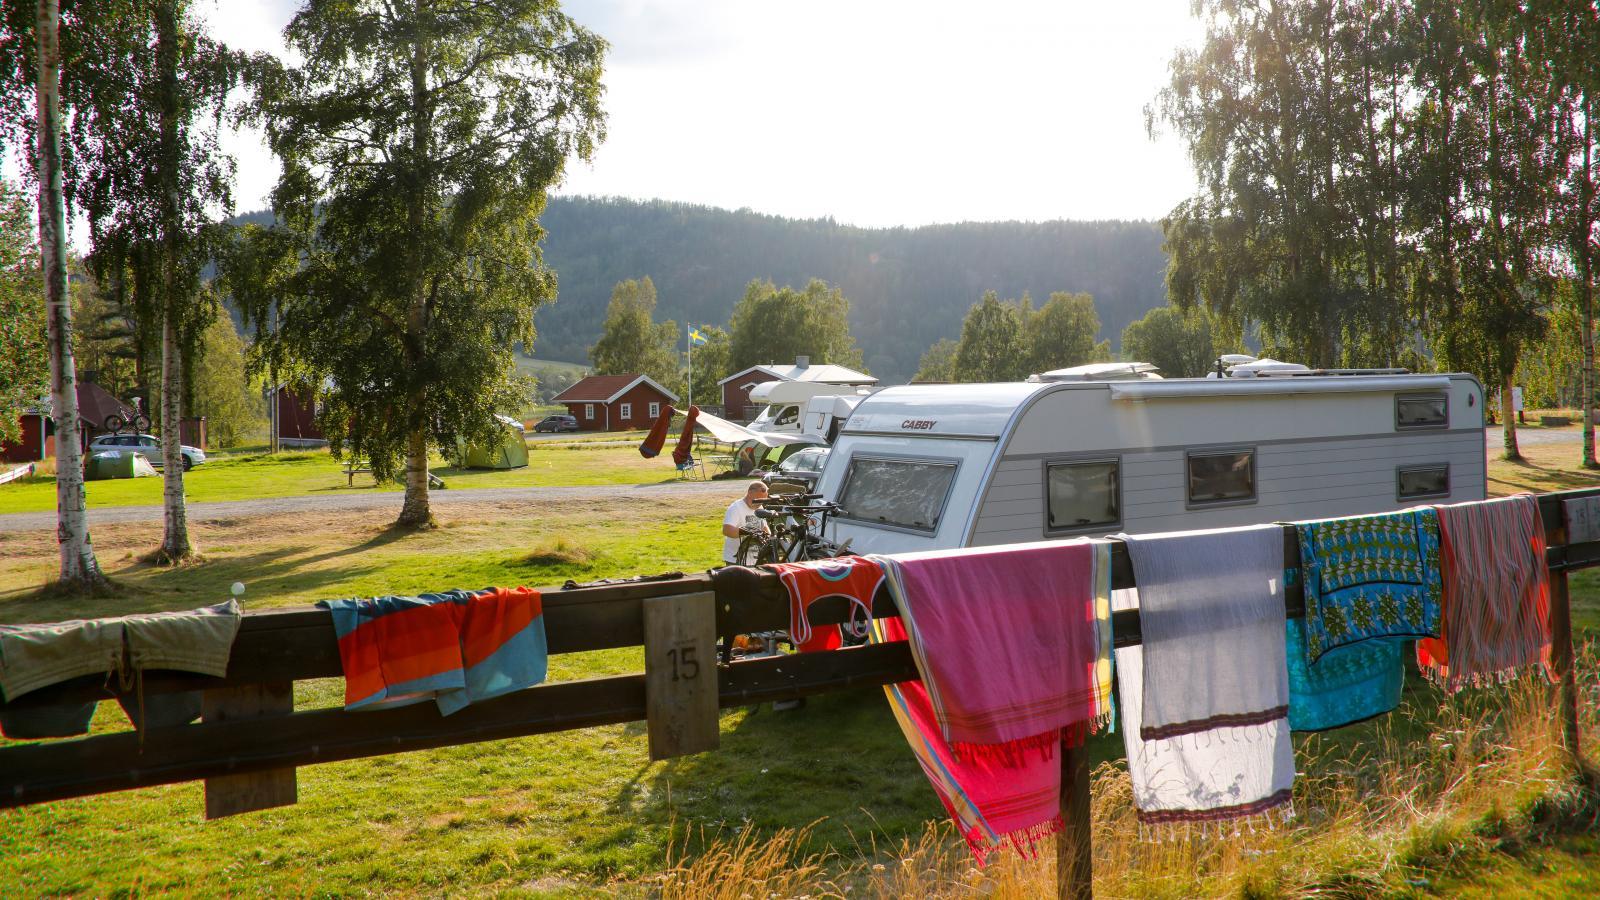 Camping på FriluftsByn vid Skulebergets fot. Missa det inte!